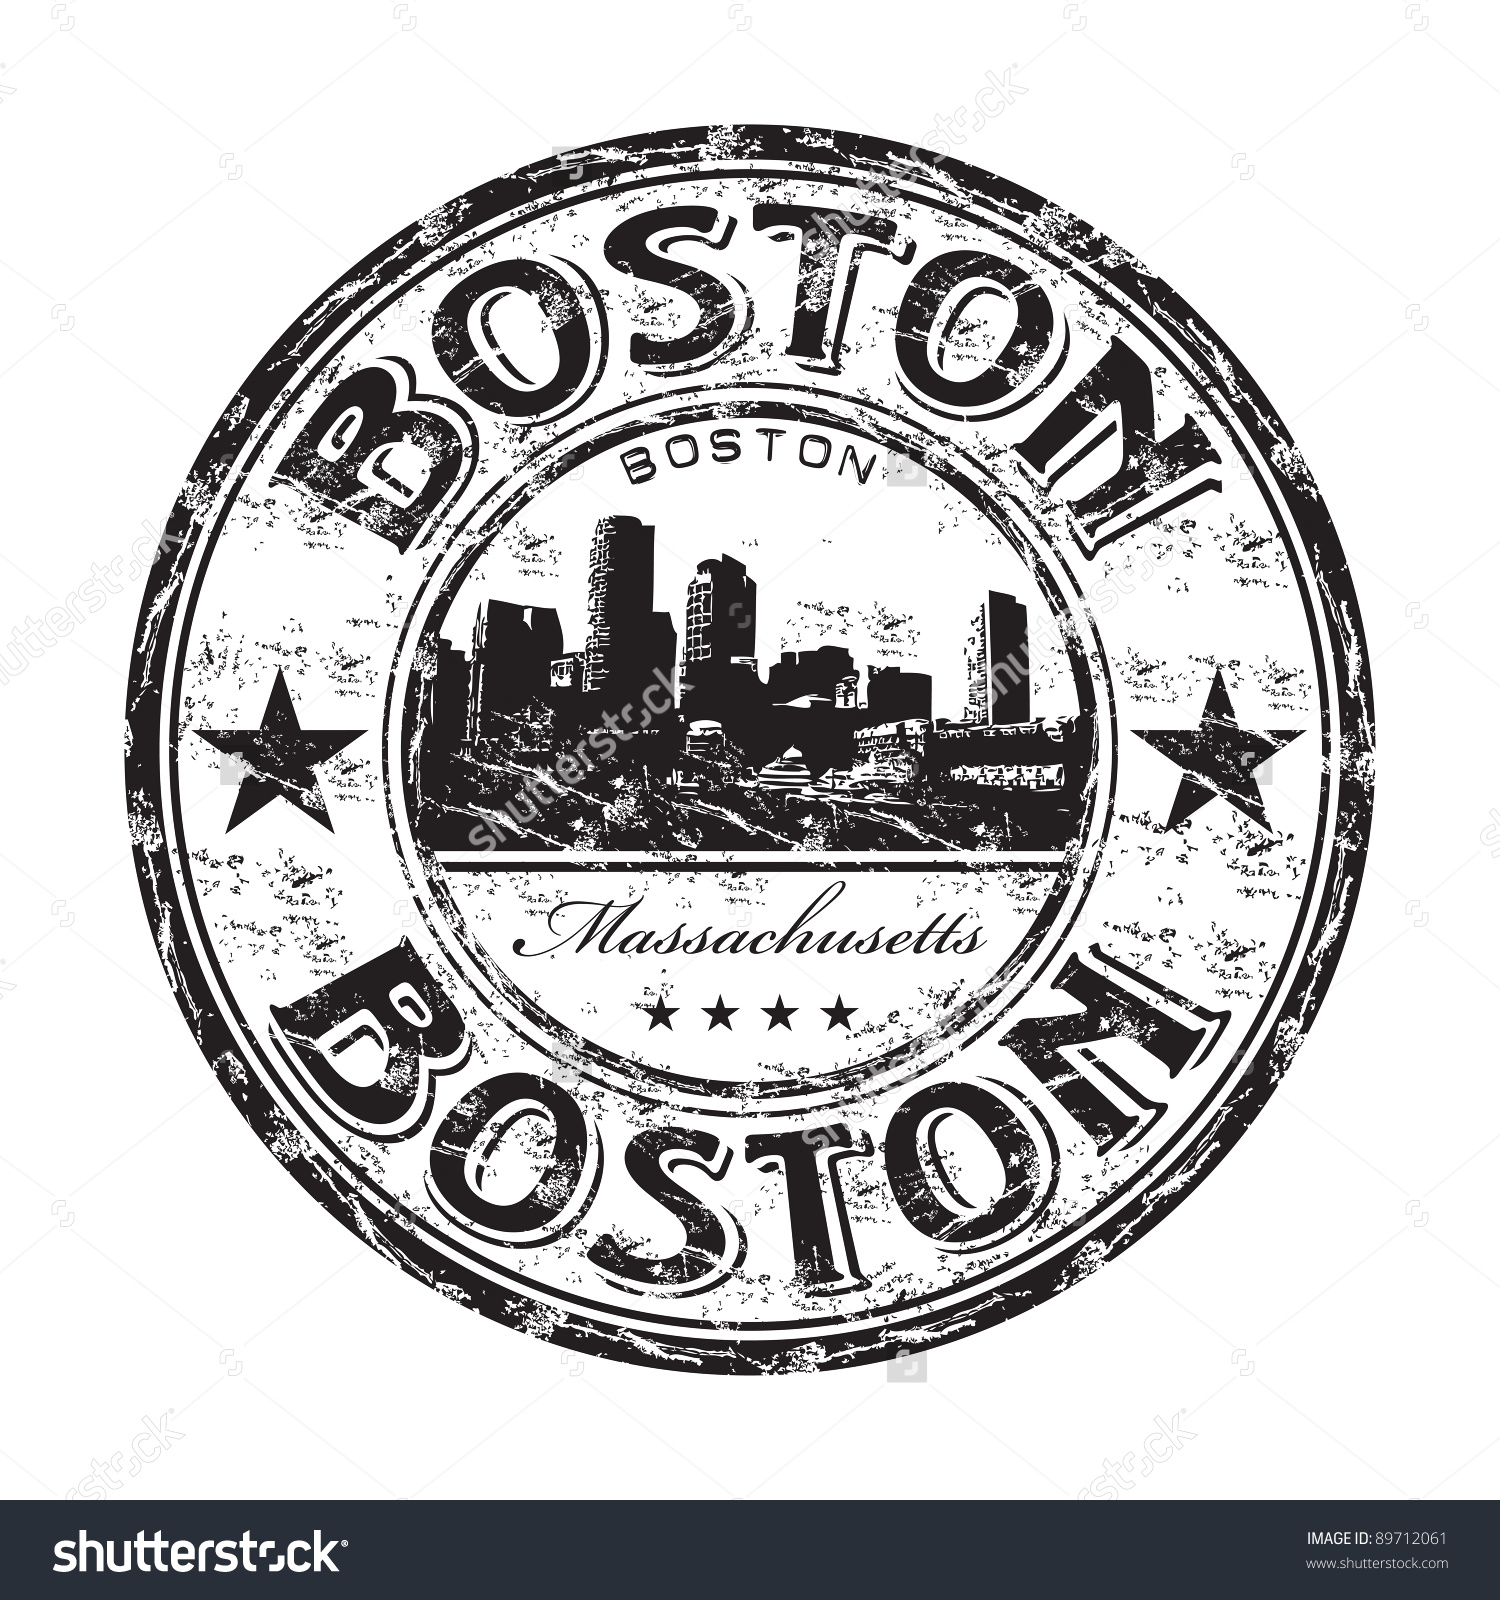 Black Grunge Rubber Stamp Name Boston Stock Vector 89712061.